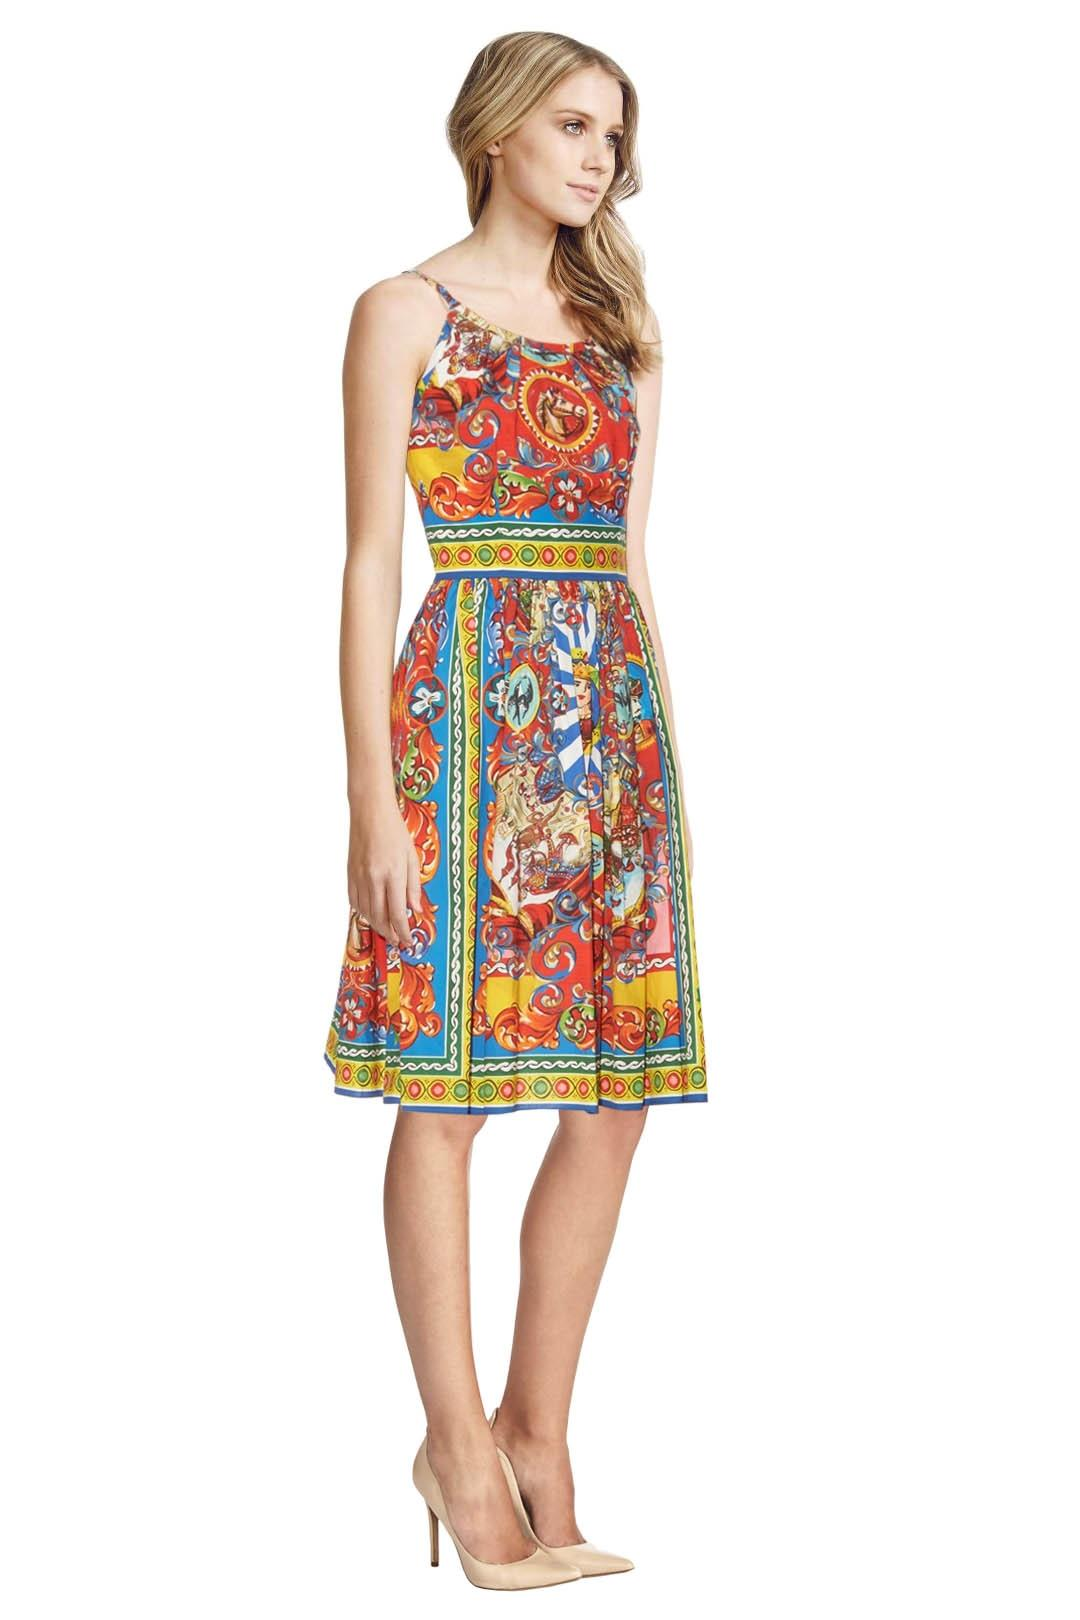 dolce gabbana dress,dolce gabbana dress,dolce and gabbana dress,dolce and gabbana dress,